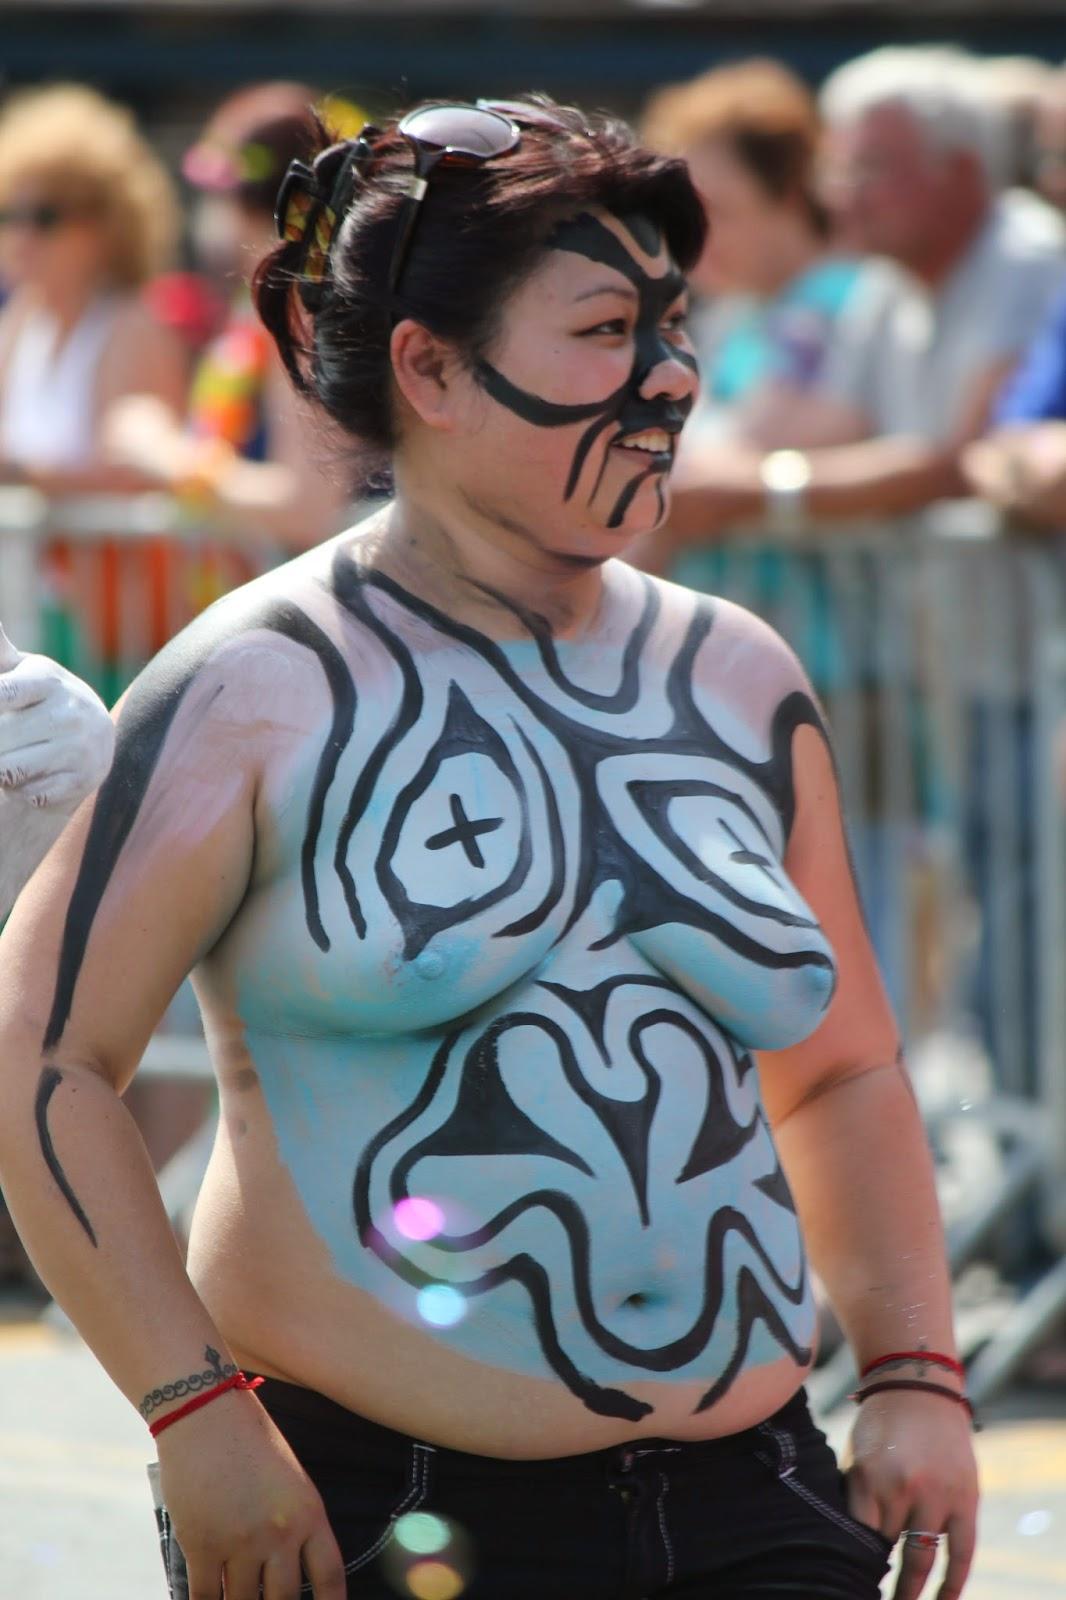 fotografia de pintura corporal - Body painting